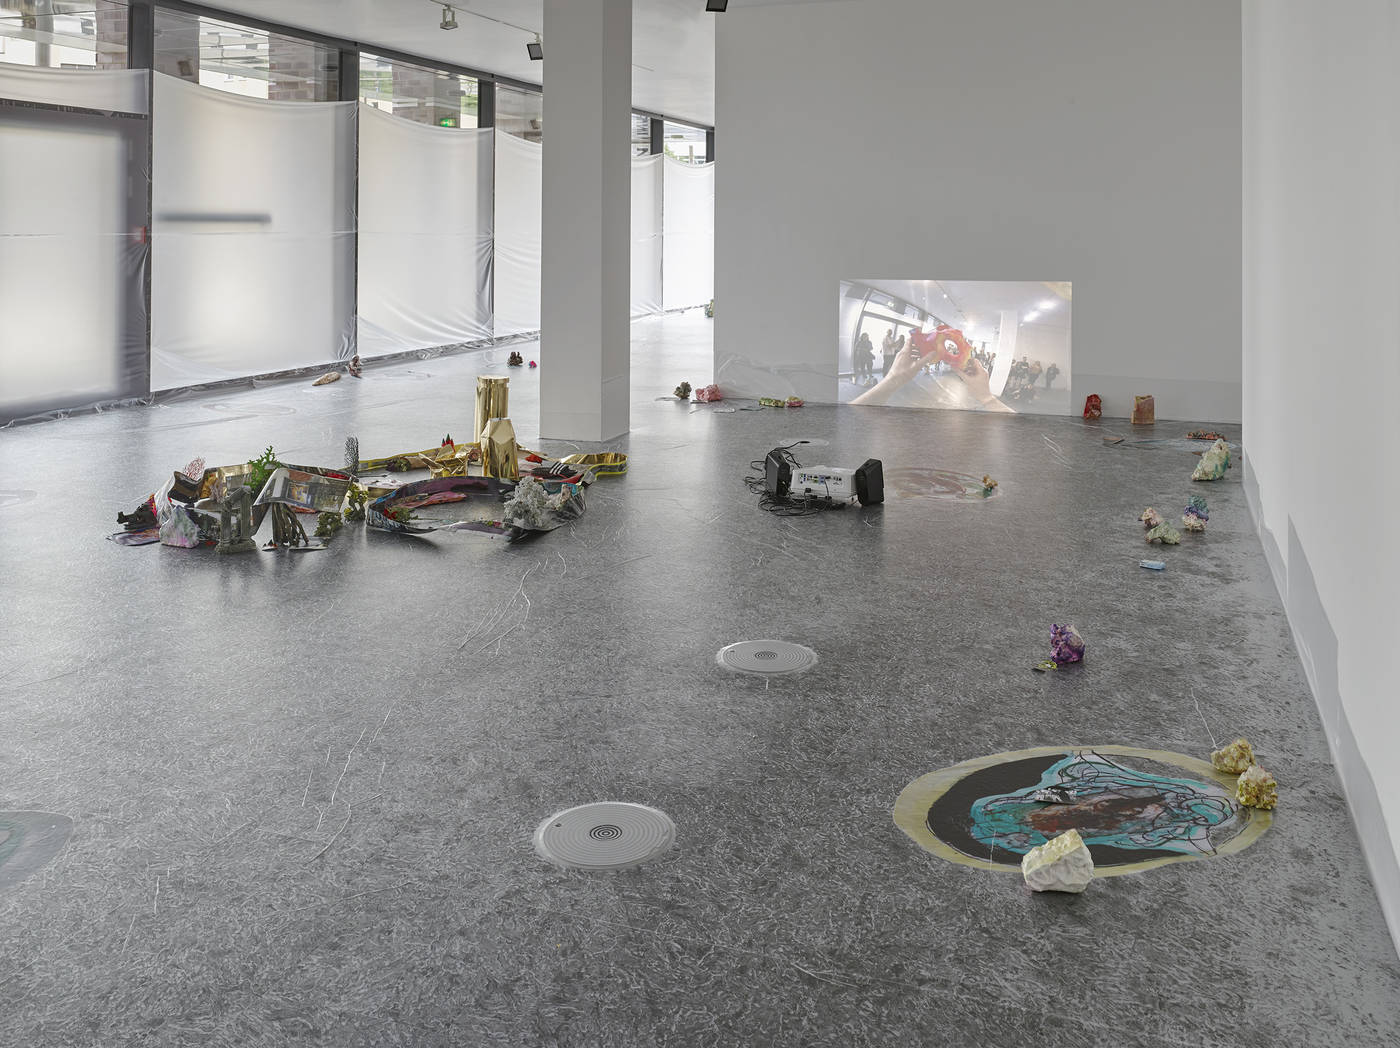 10_Dortmunder Kunstverein_Sam Keogh EUROCOPTER EC135_Photo Simon Vogel